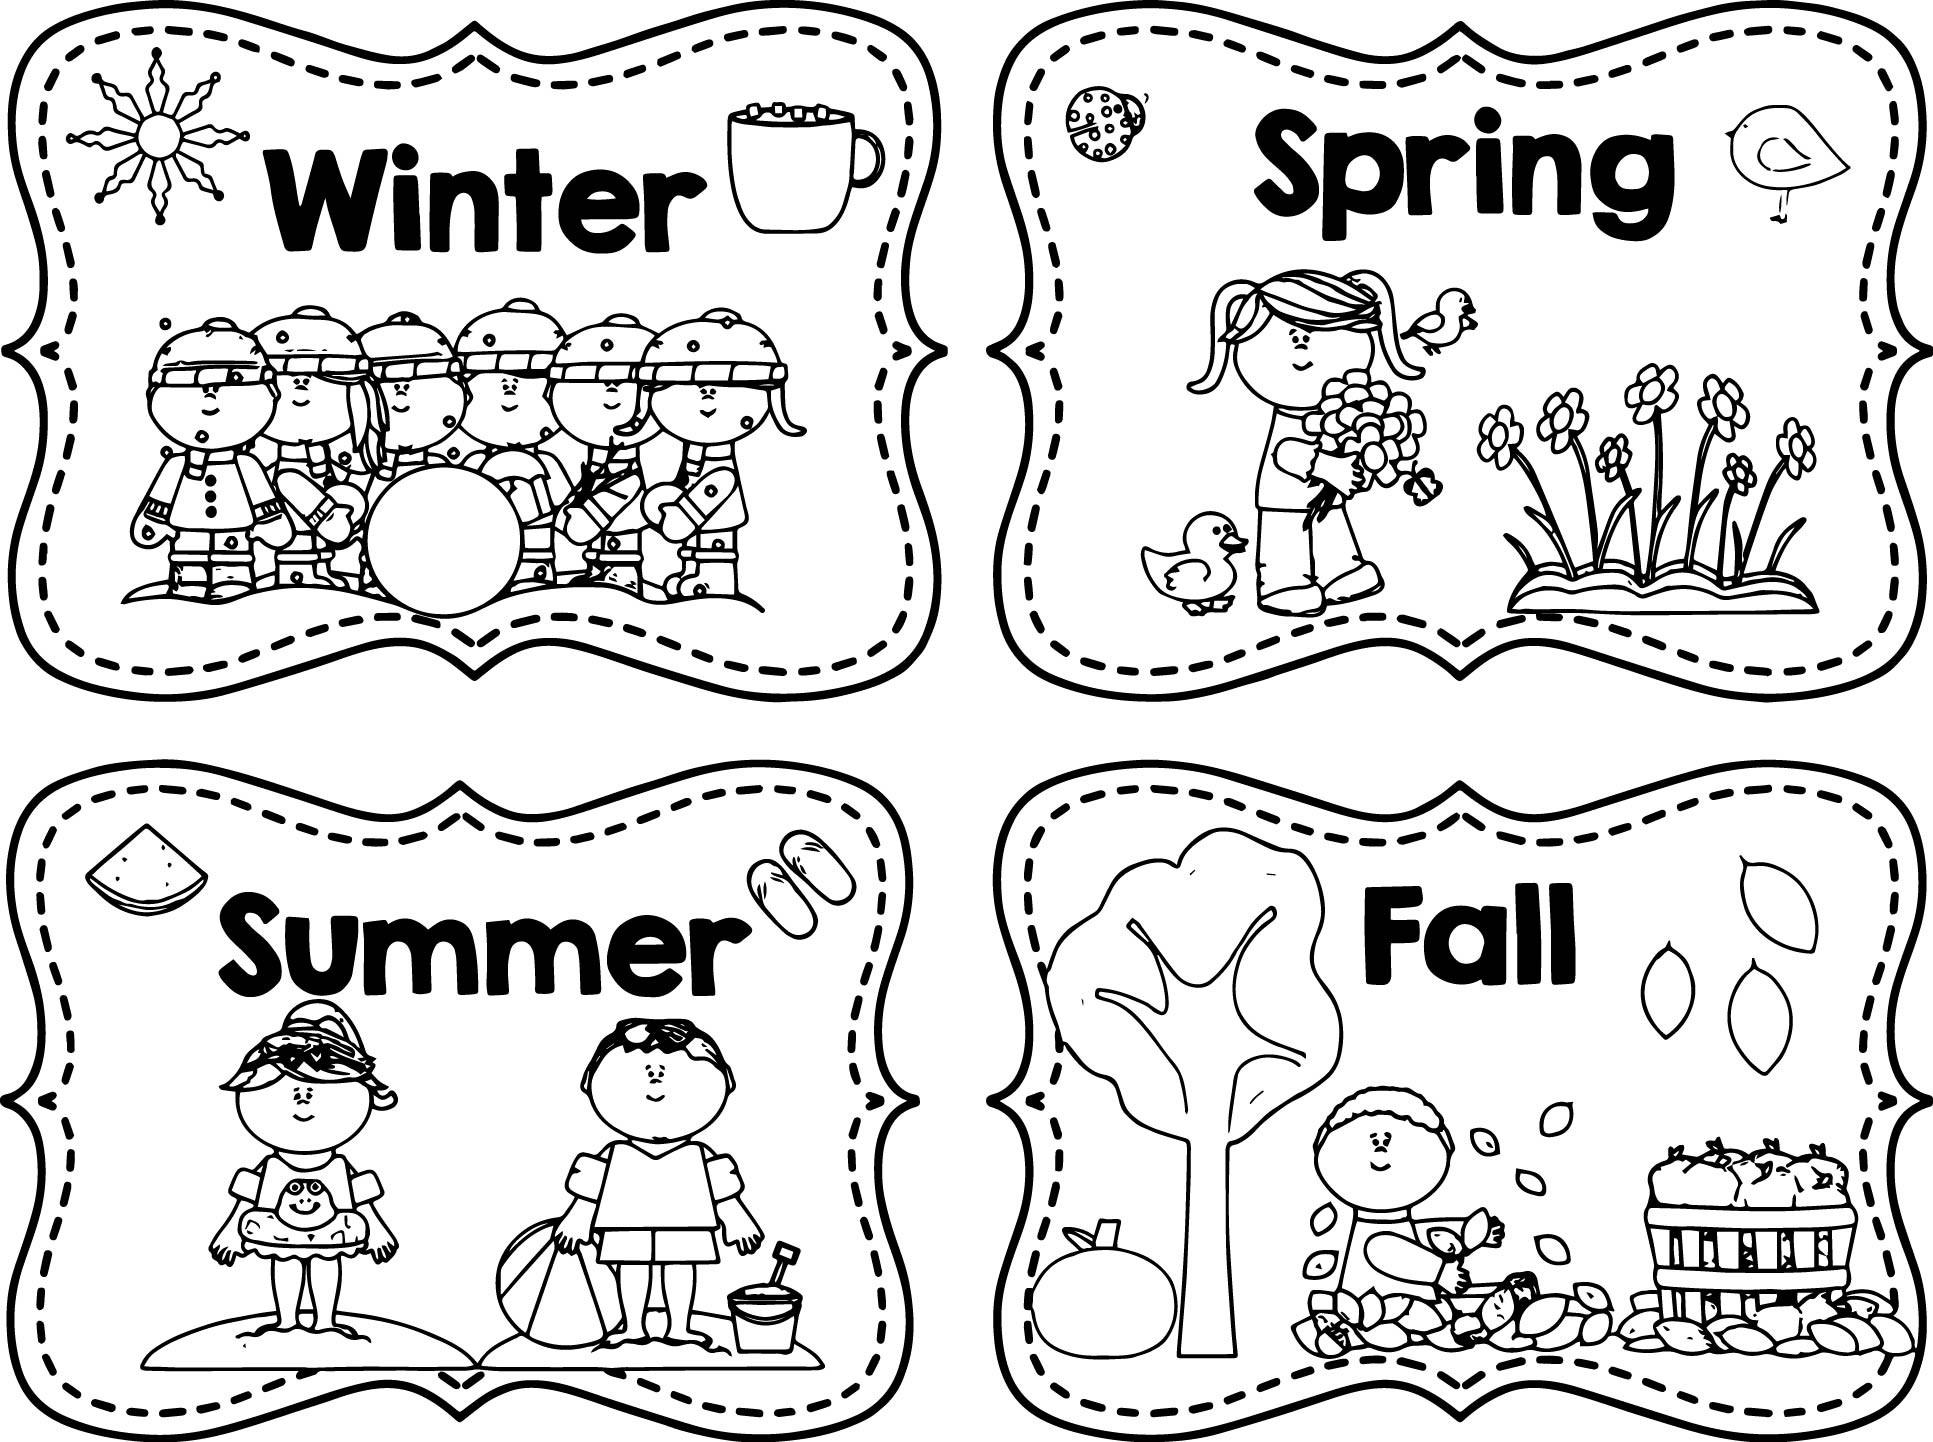 Seasons Coloring Pages  4 Seasons Coloring Pages to Print